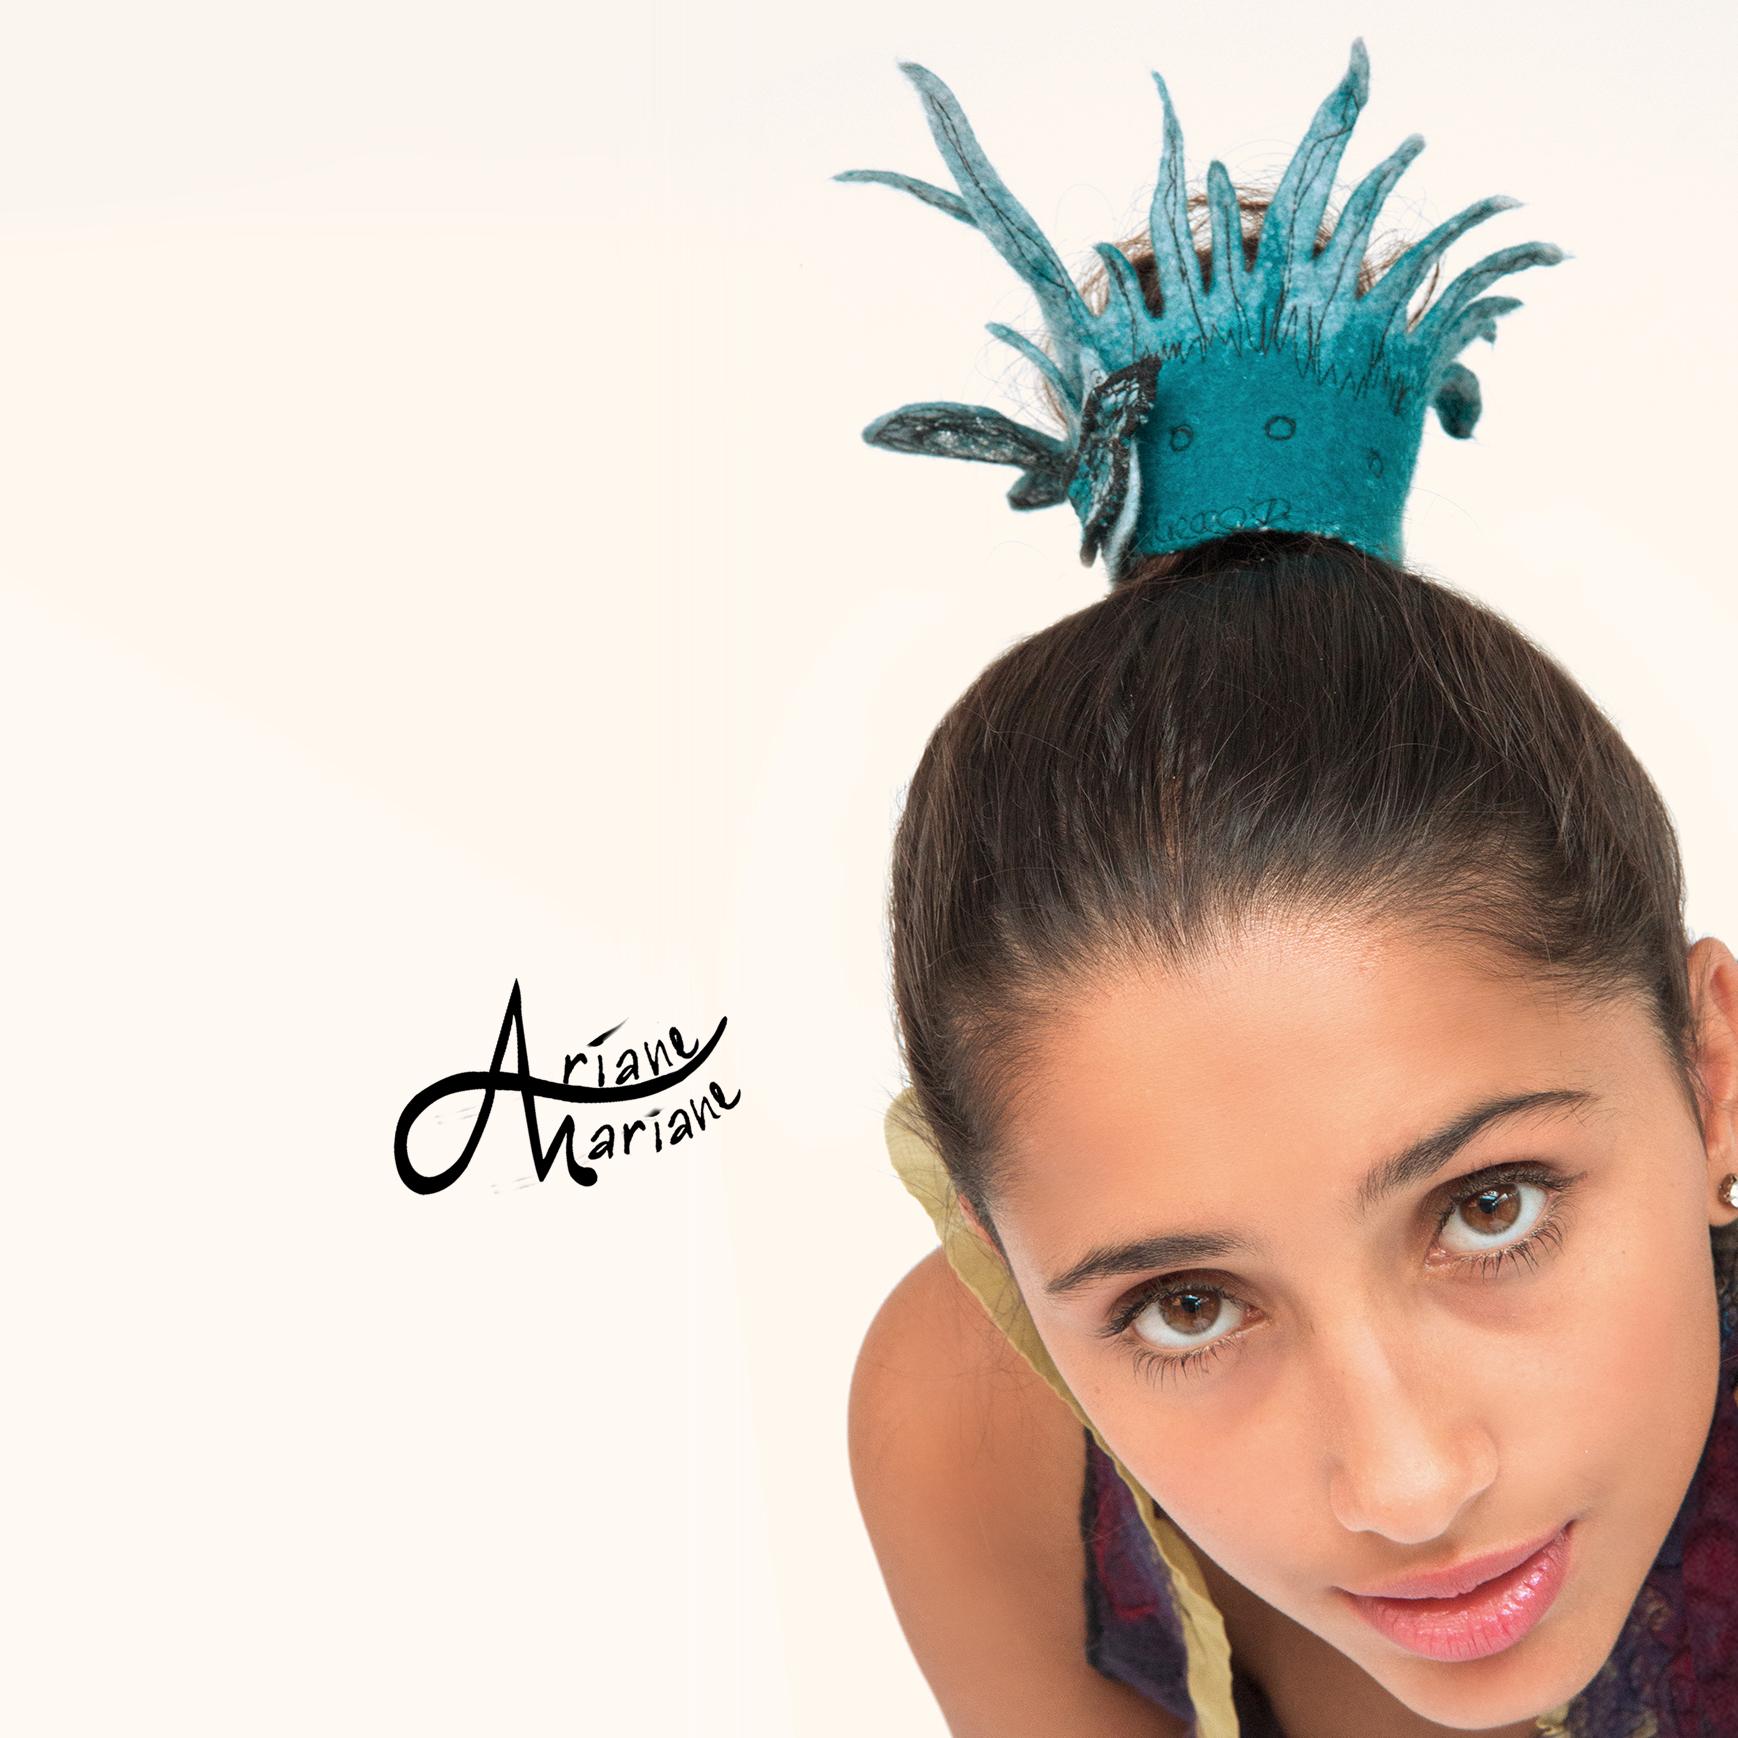 A funky hair accessory